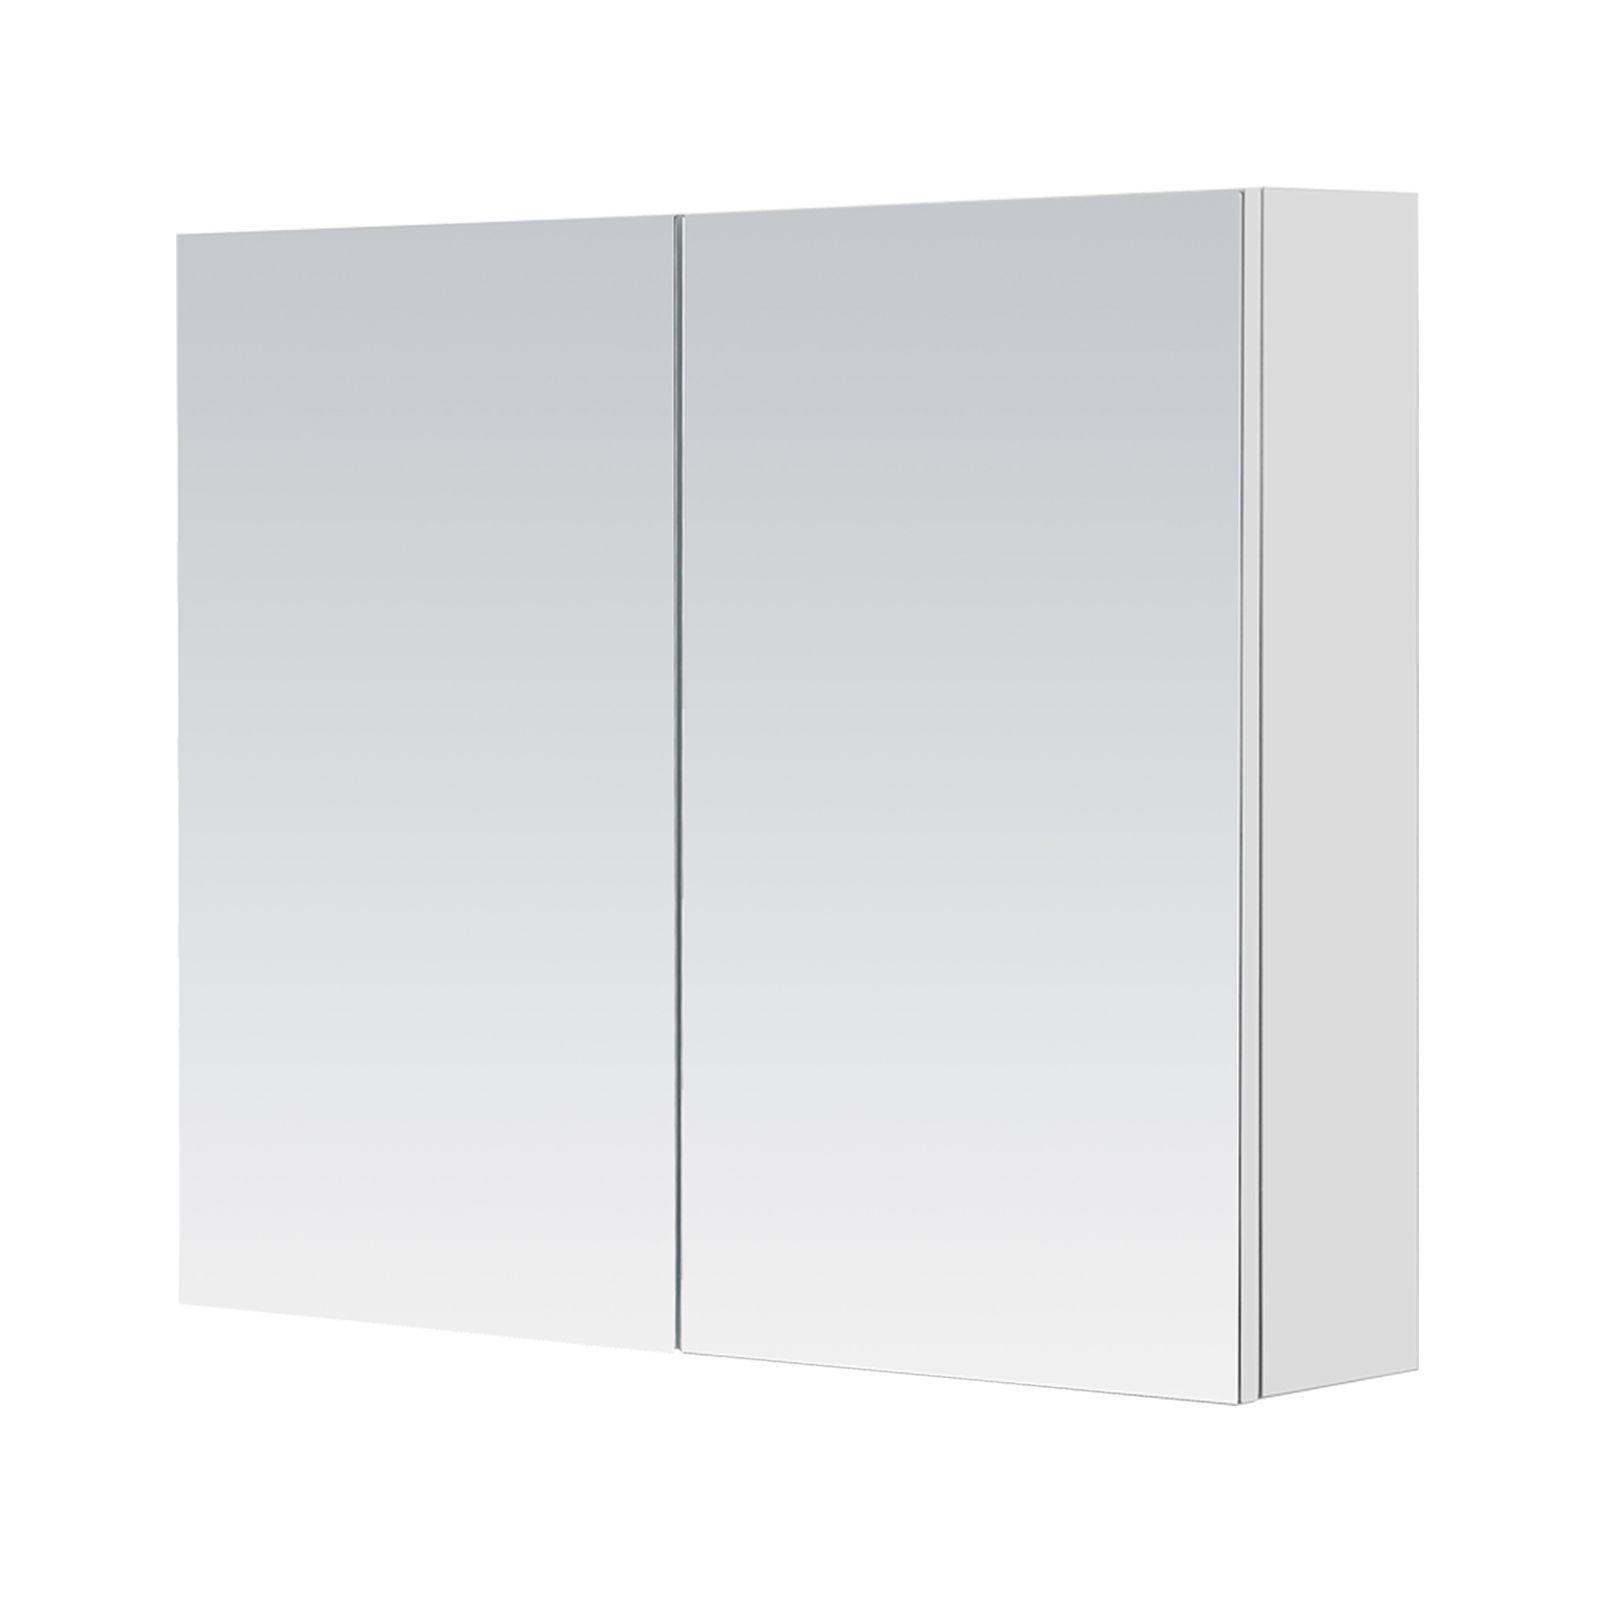 Bedford 450mm White 1 Door Pantry Pantry Cabinet Open Plan Kitchen Dining Living Living Room Floor Plans